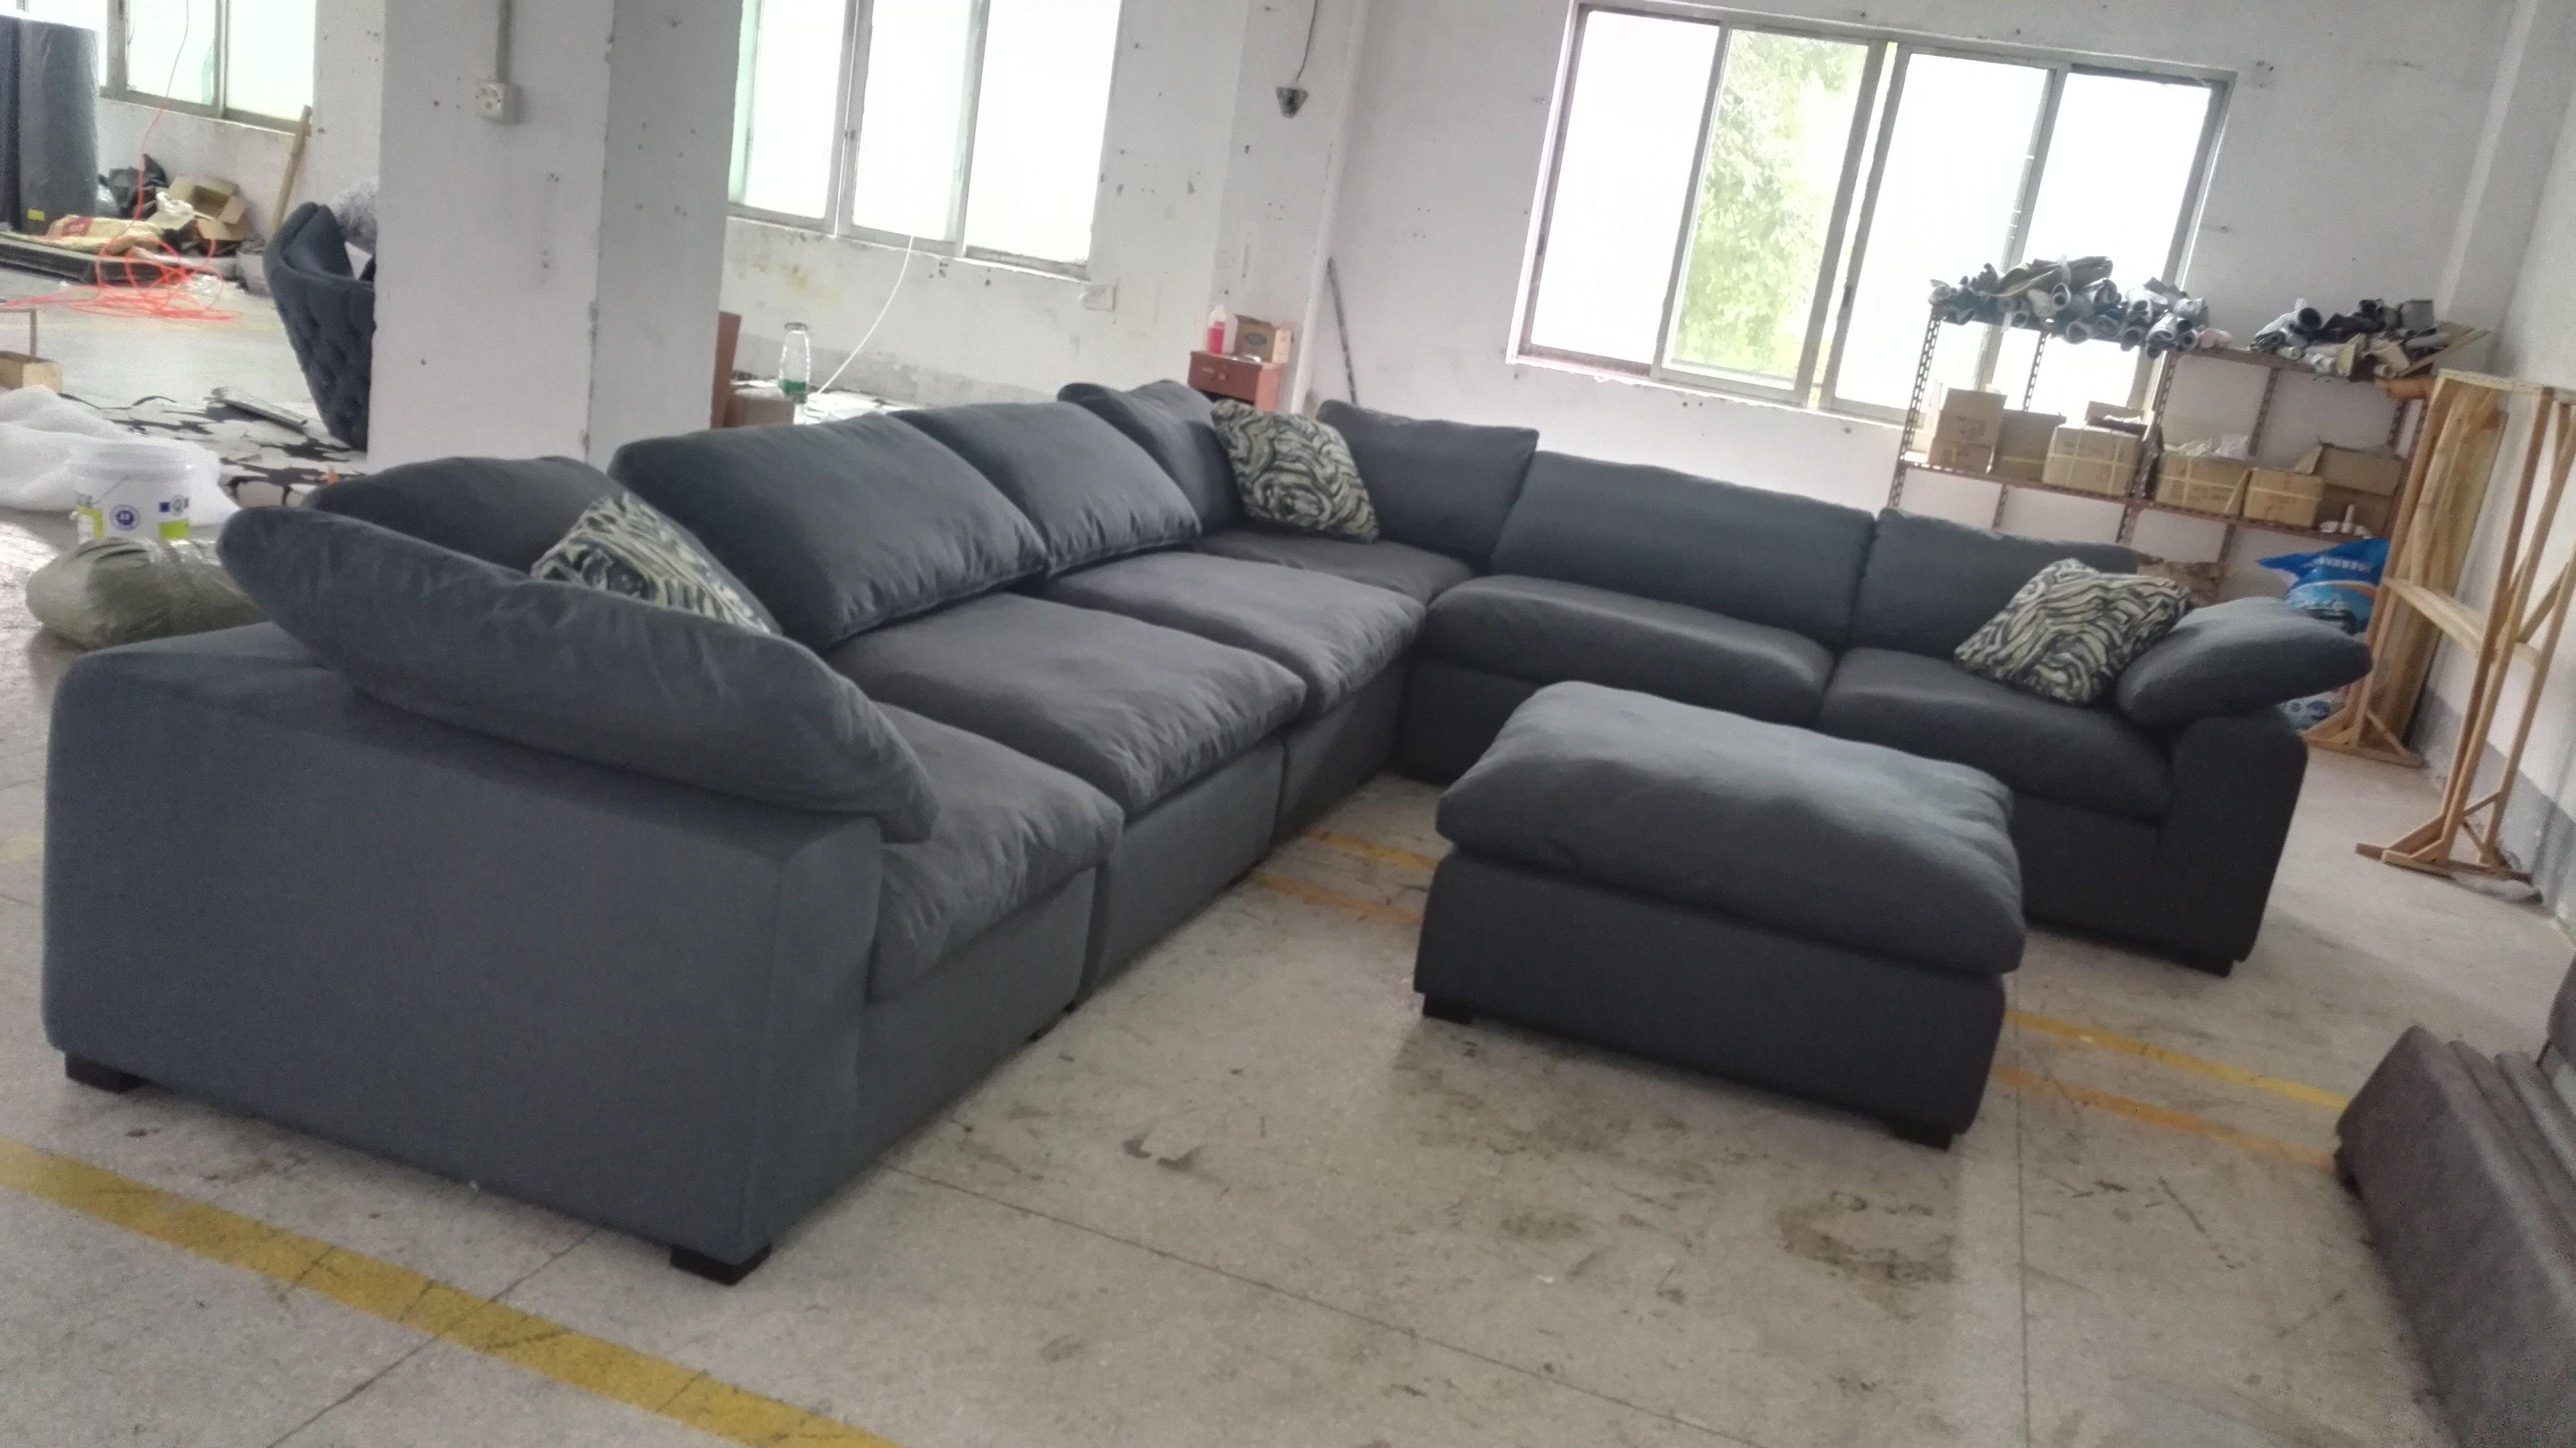 New Design Modern Sofa Set Sofaset Sofa Cocheen Modernsofa Cocheendesign Livingroomsofa Furni With Images Modern Sofa Set Contemporary Furnishings Sofa Manufacturers